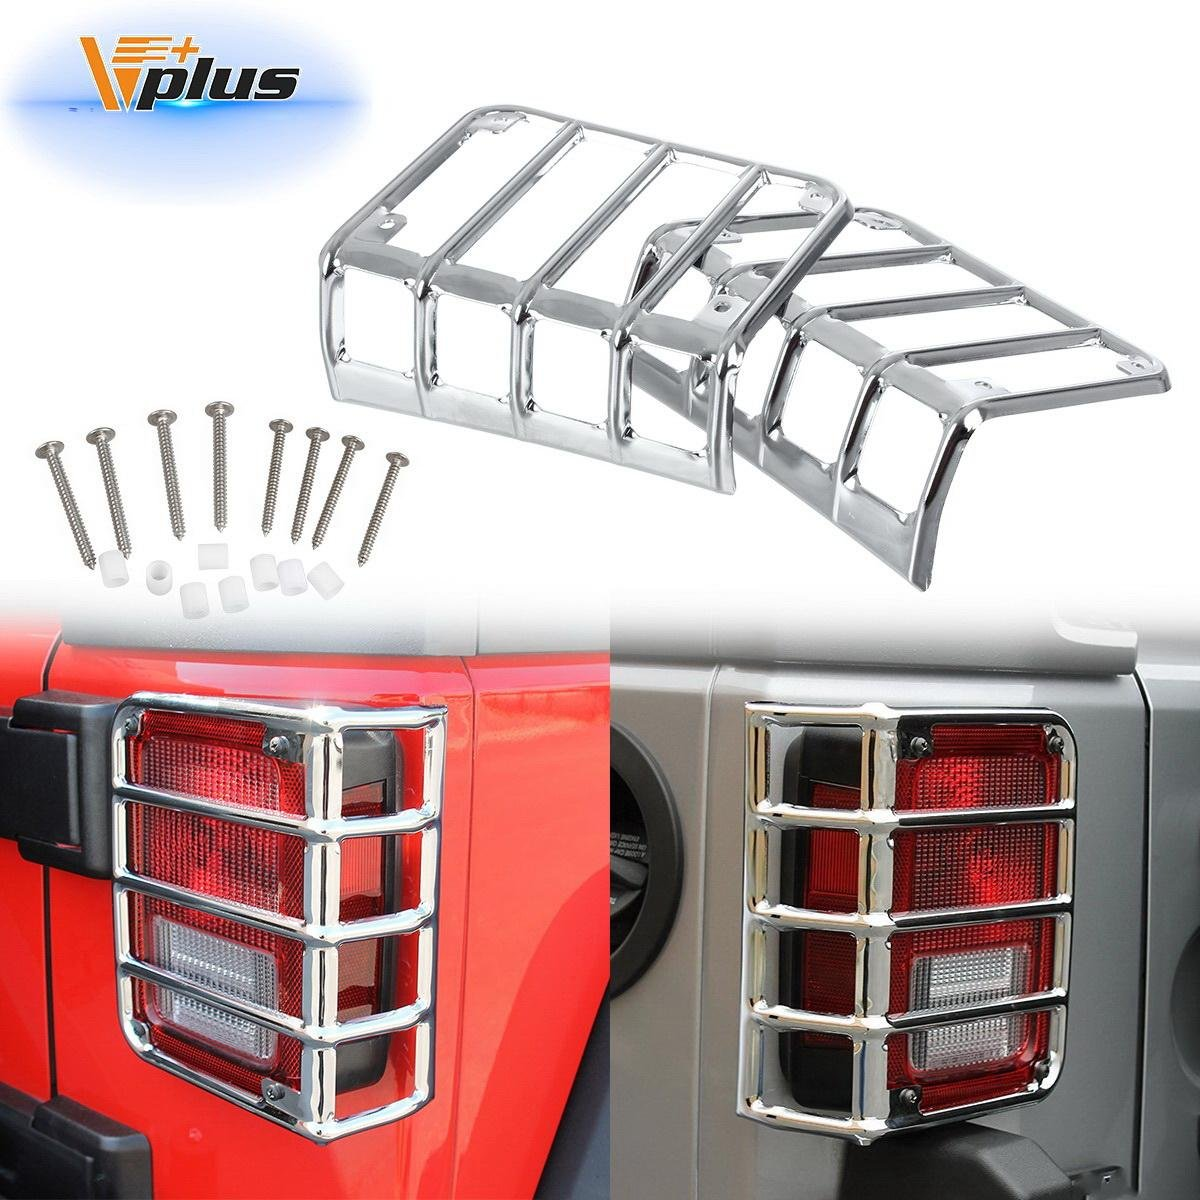 Vplus Five Bar Silver Rear Euro Tail Light Guard Cover Protector 2007-2016 Jeep Wrangler Pair